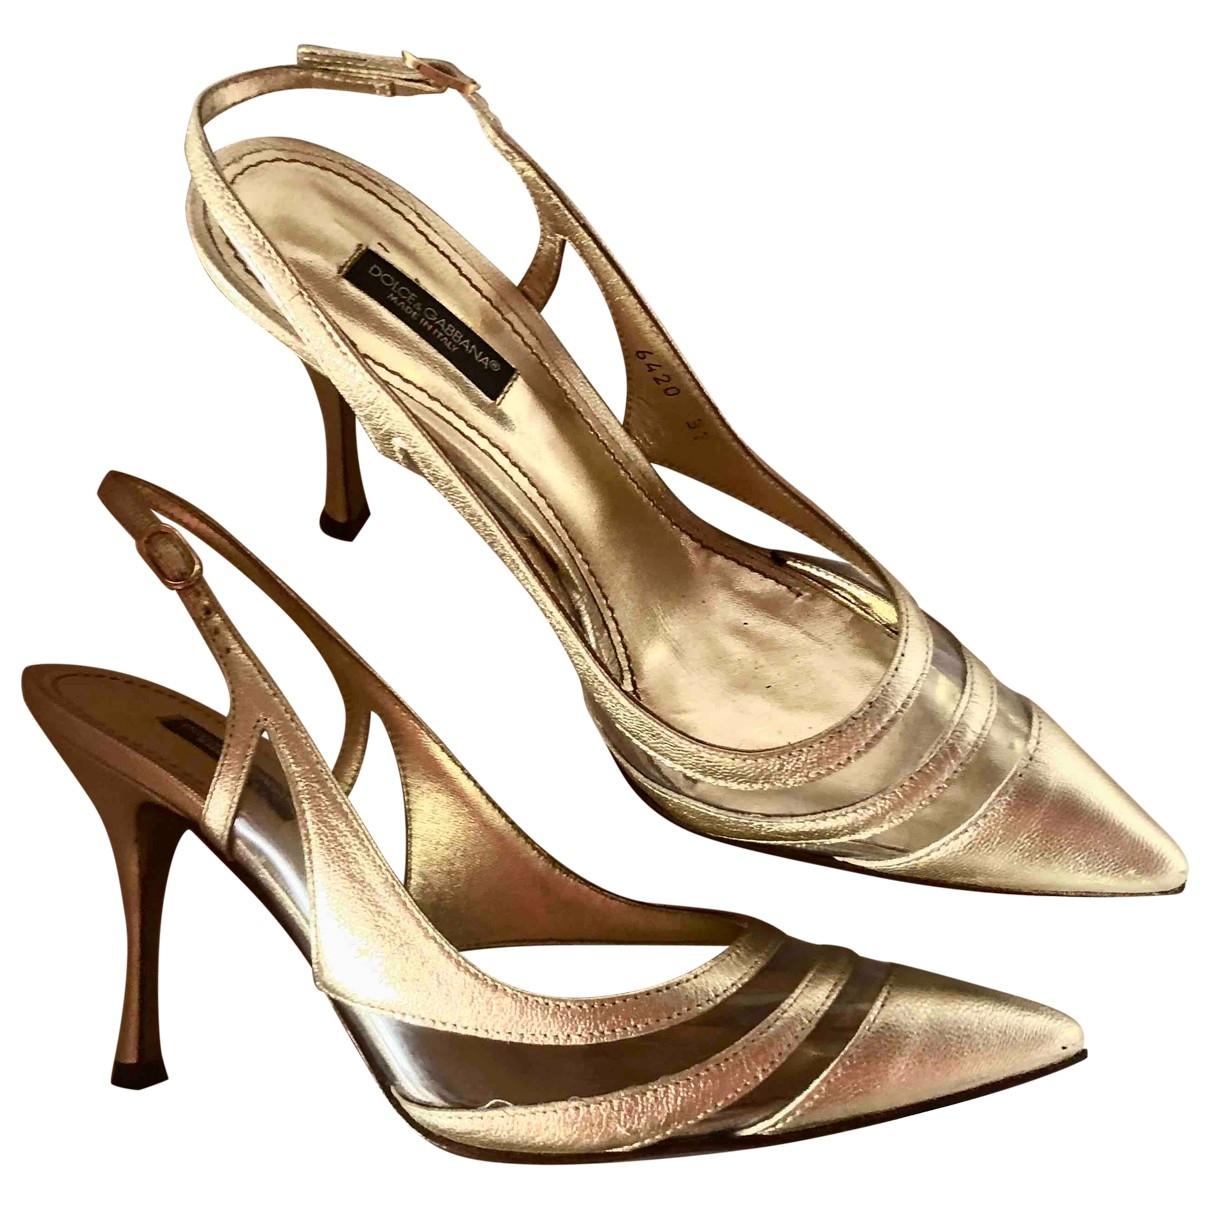 Dolce & Gabbana \N Gold Leather Heels for Women 37 EU